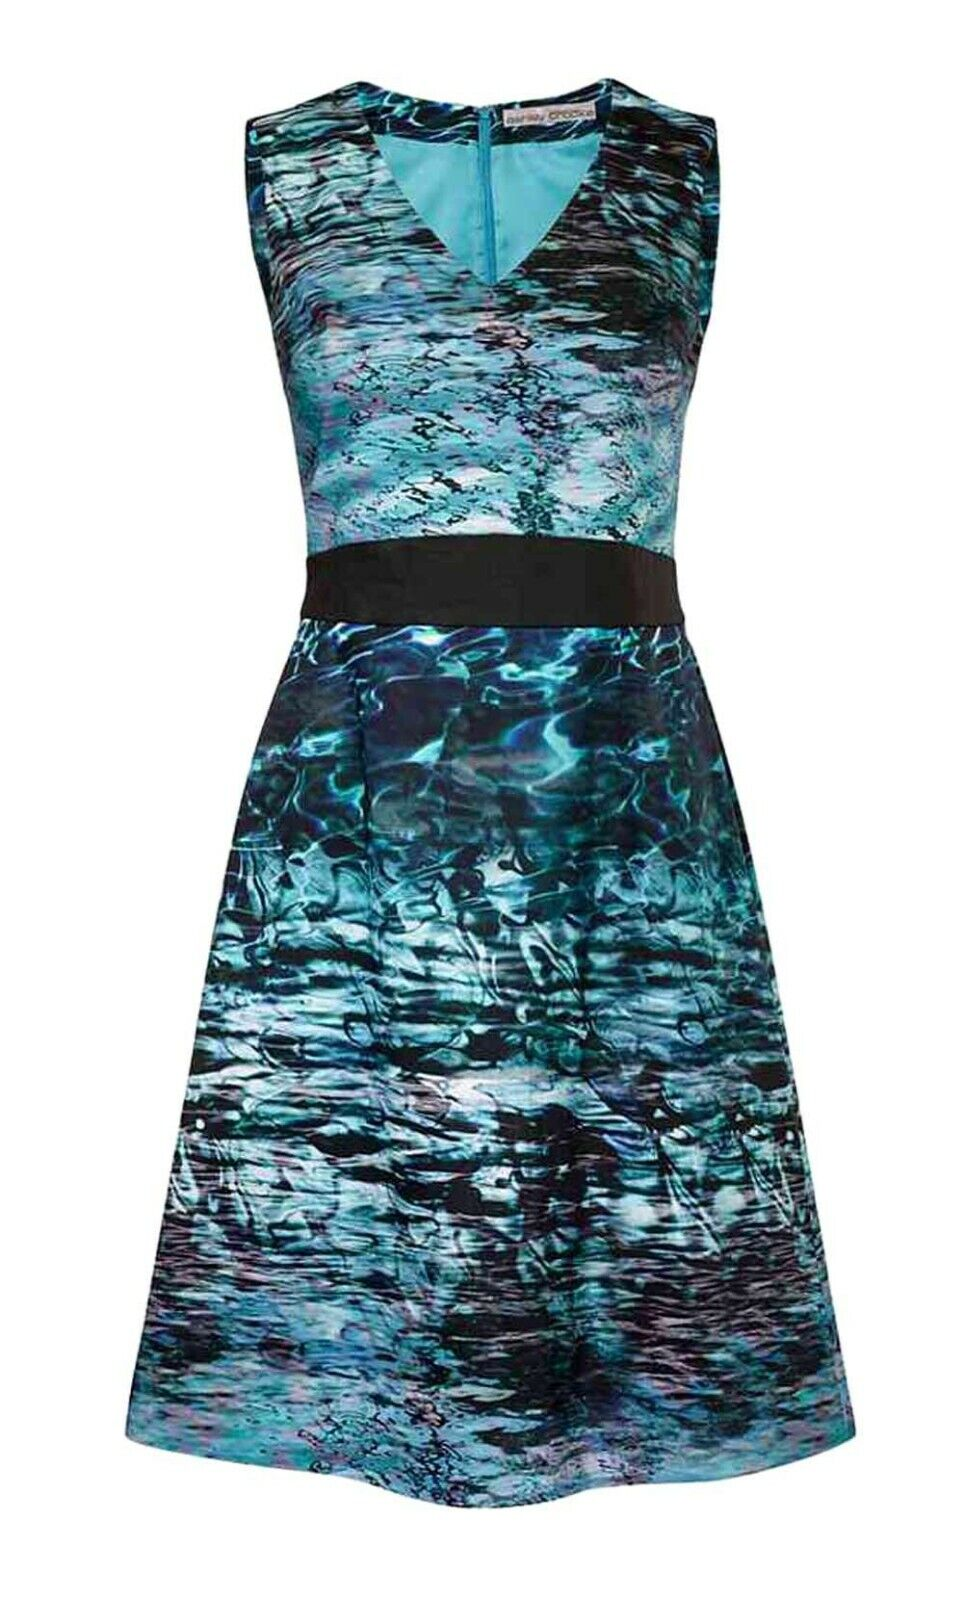 TCJ  Ashley Brooke Damen Designer Kleid Druckkleid Sommerkleid Aqua blau 34-40